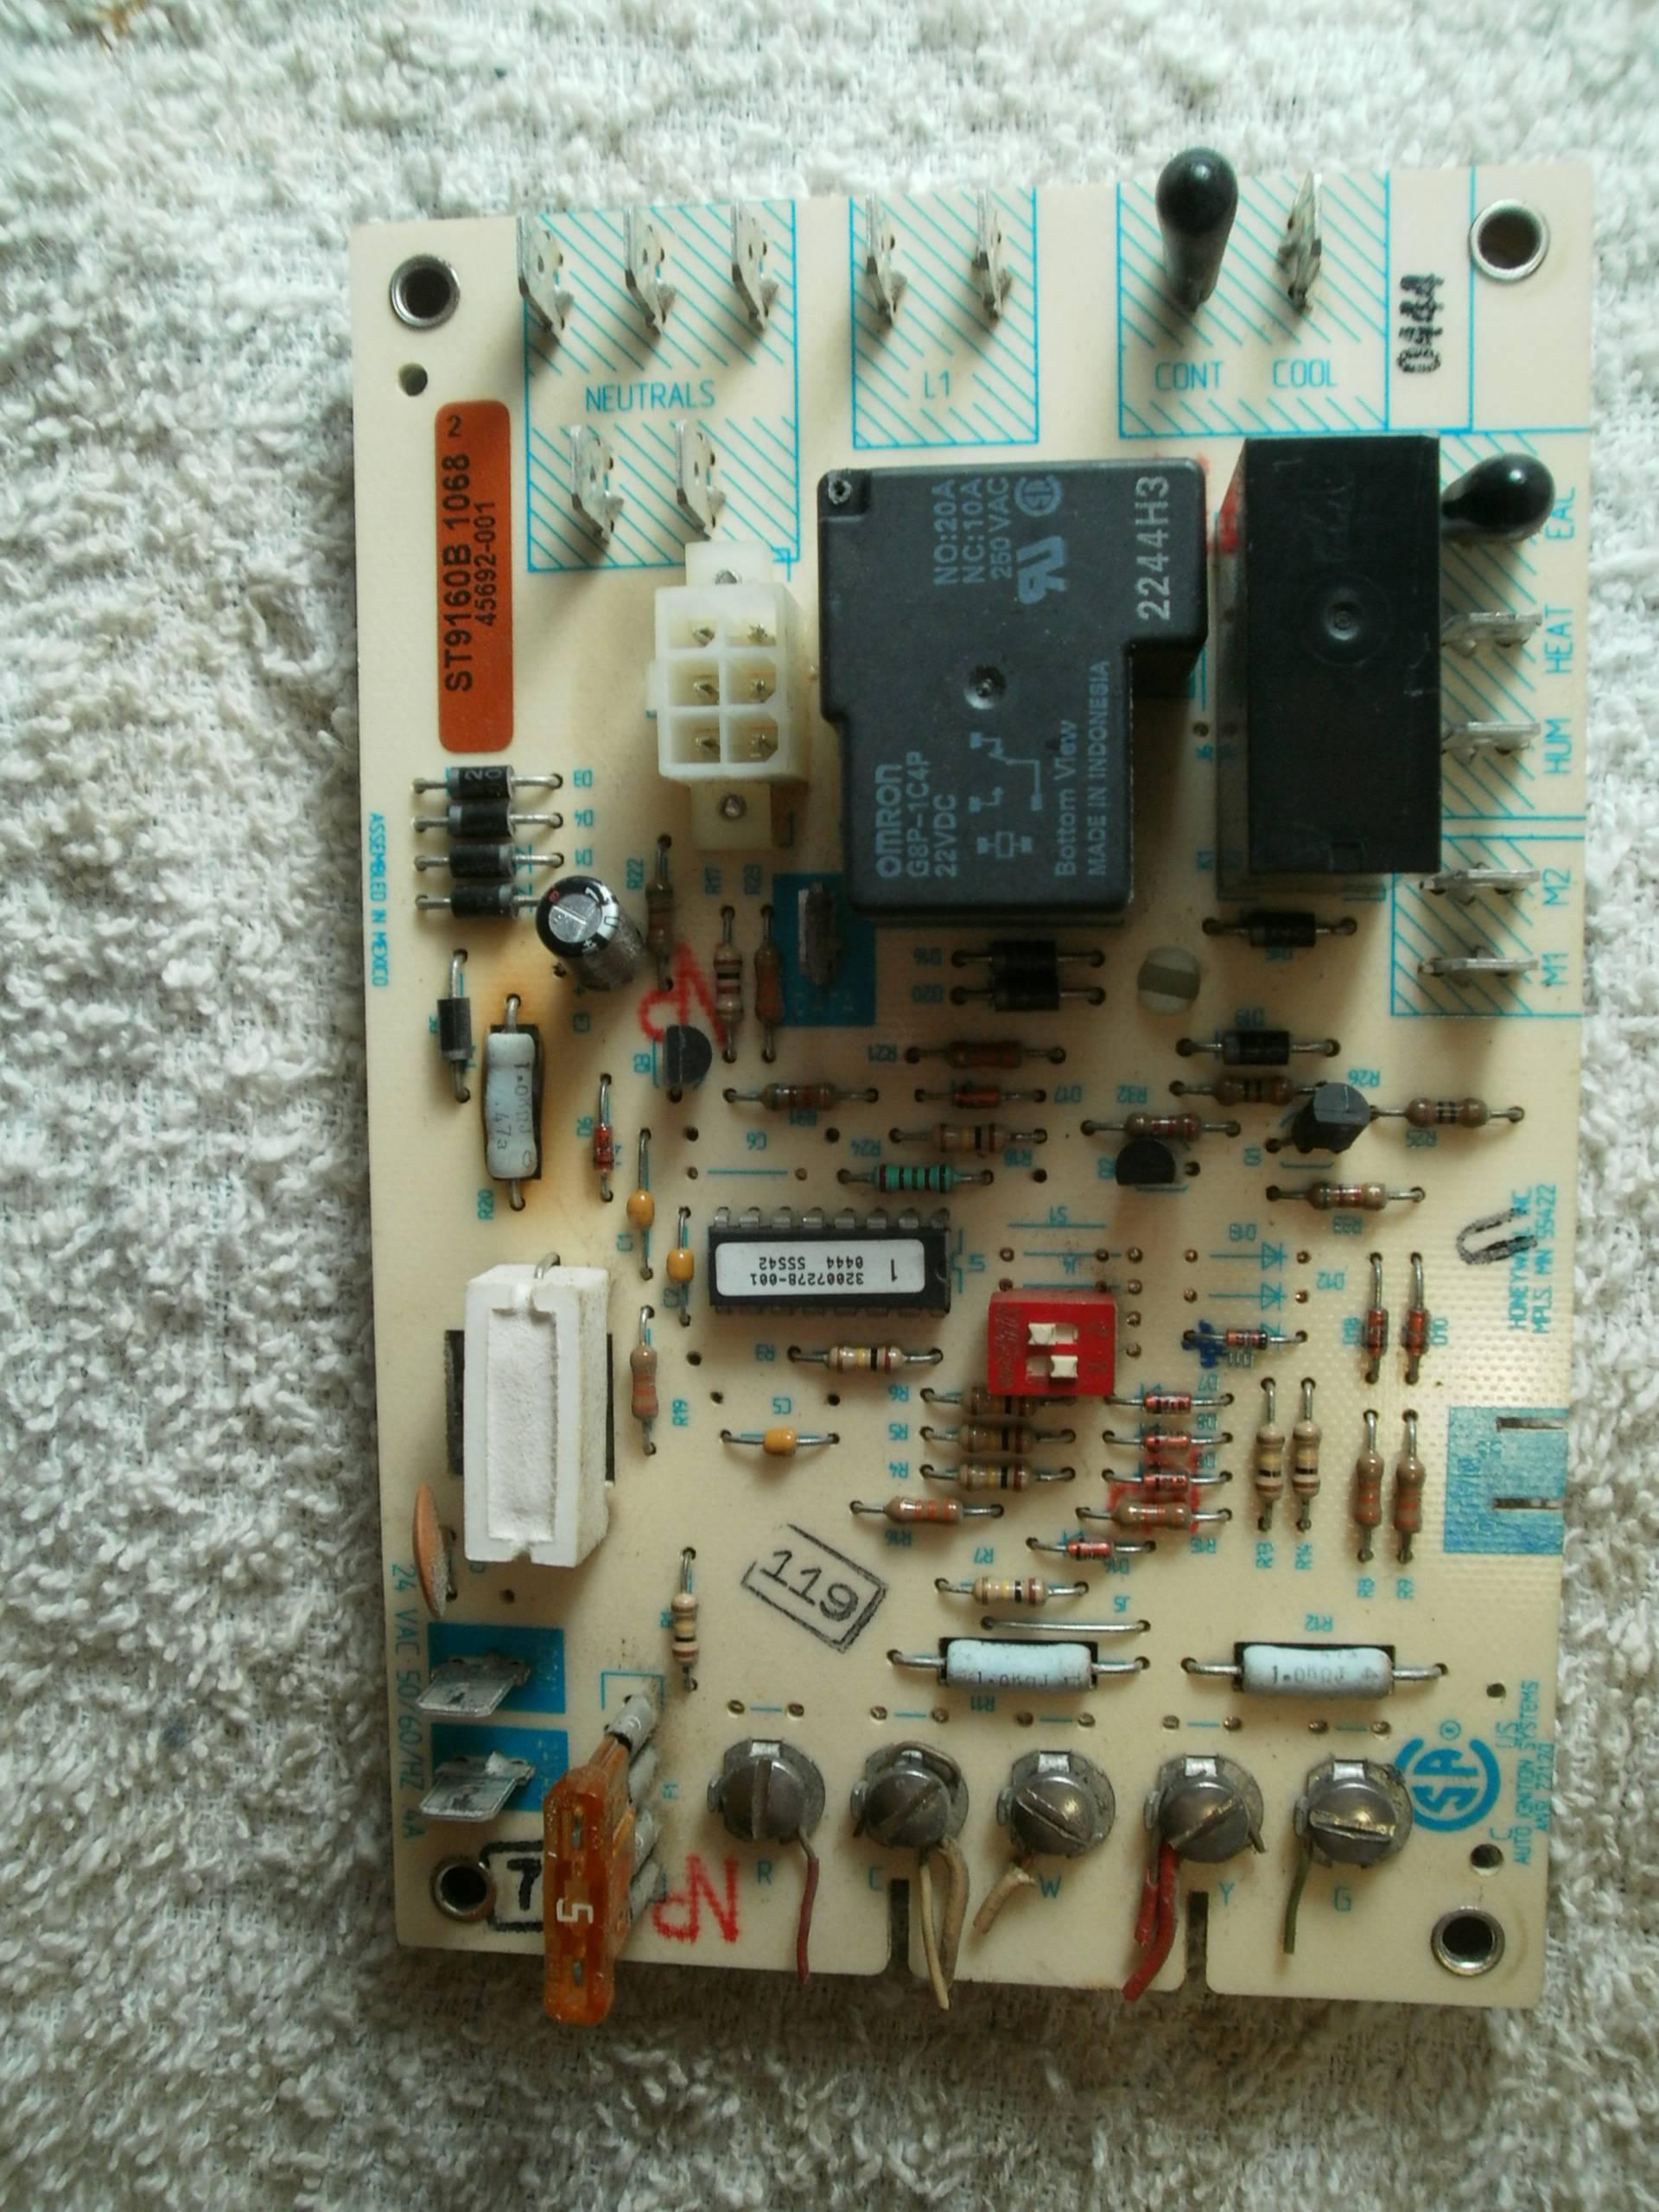 hvac wire diagram western star truck wiring - troubleshoot ac issue, no inside blower home improvement stack exchange